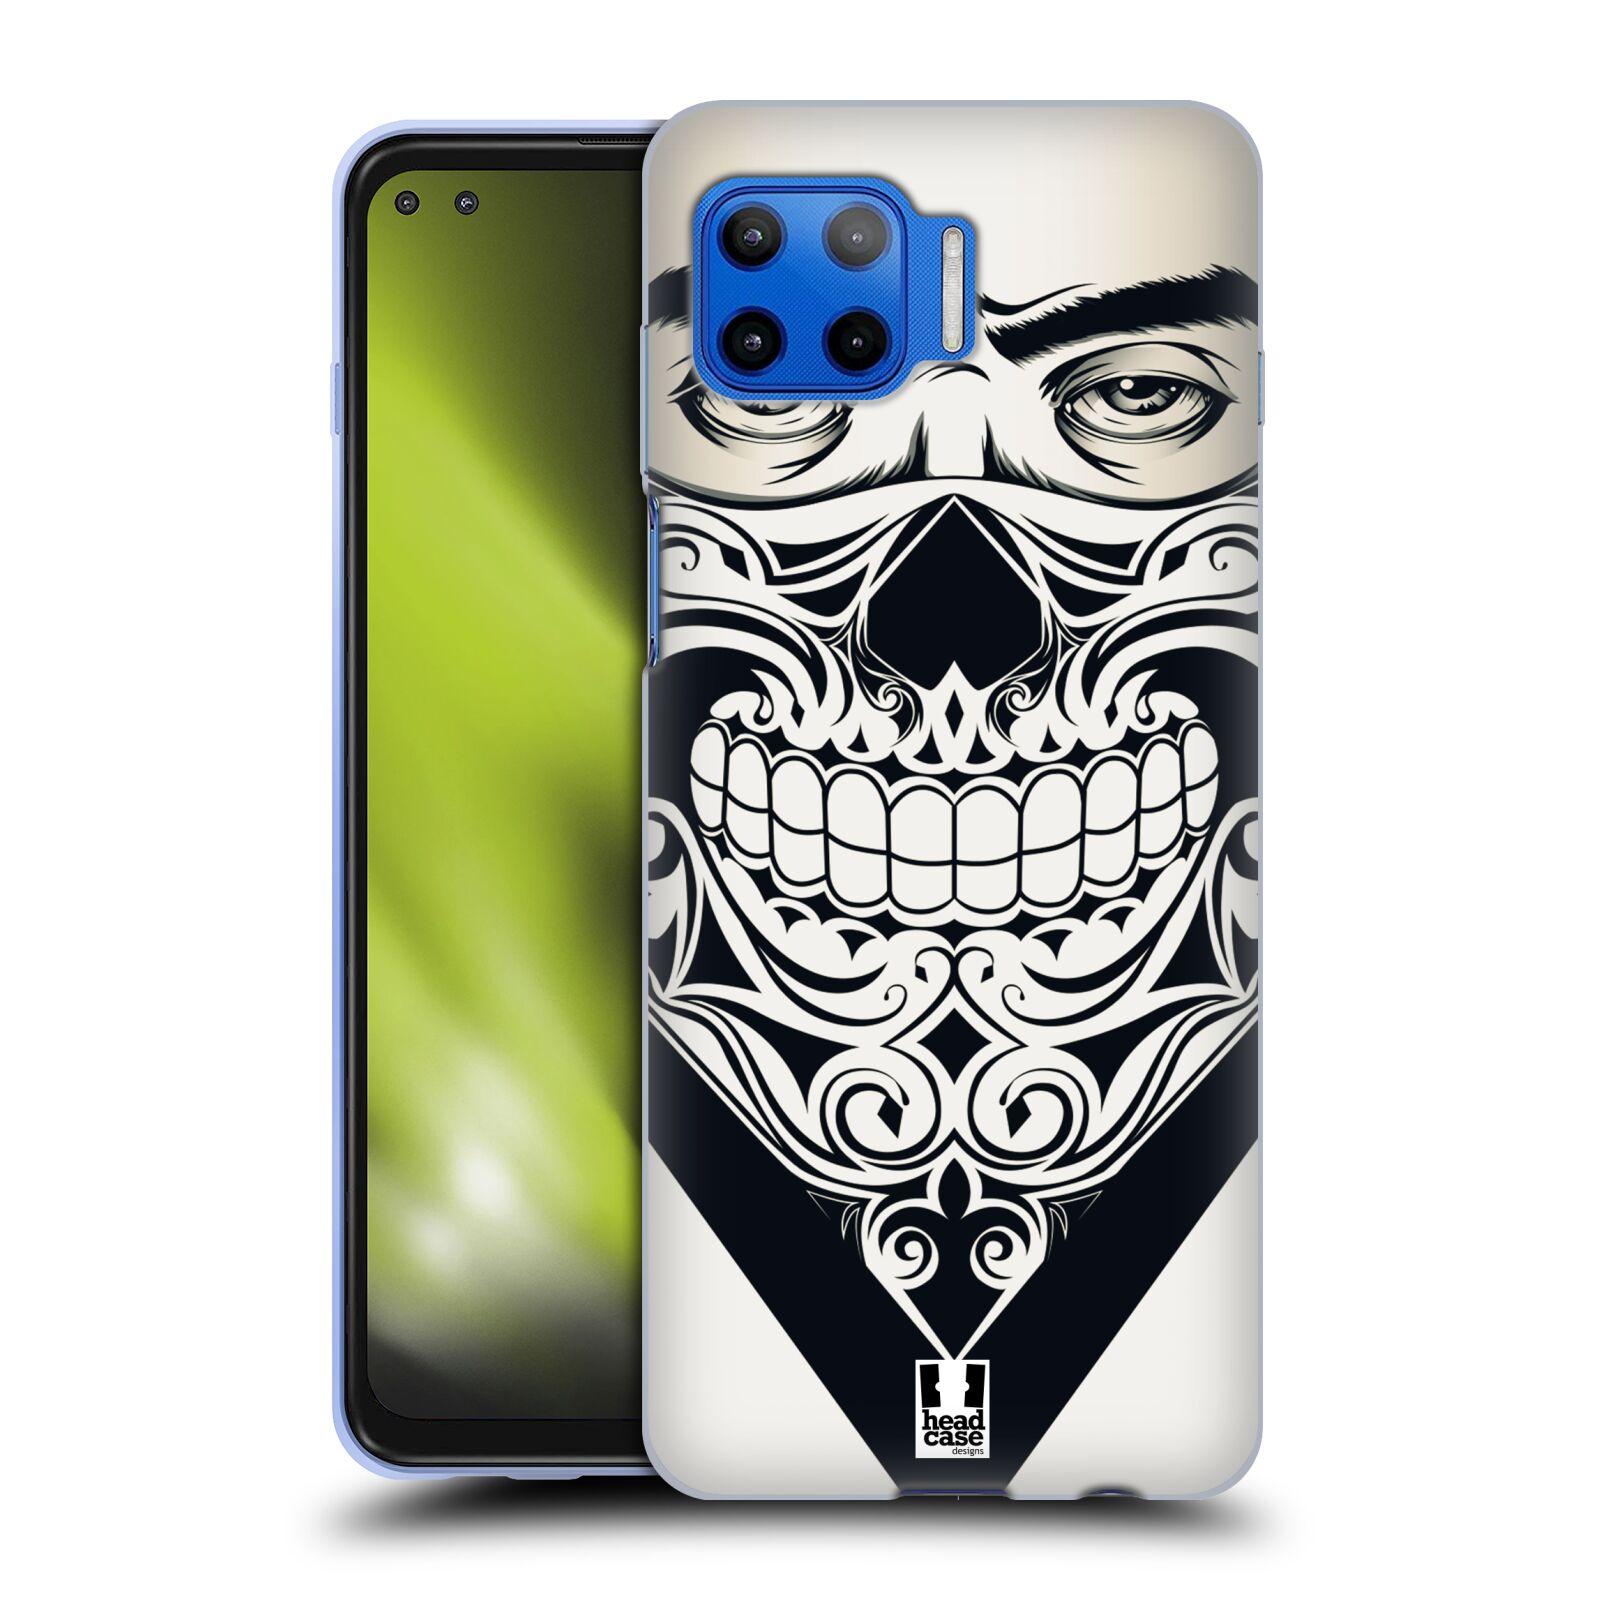 Silikonové pouzdro na mobil Motorola Moto G 5G Plus - Head Case - LEBKA BANDANA